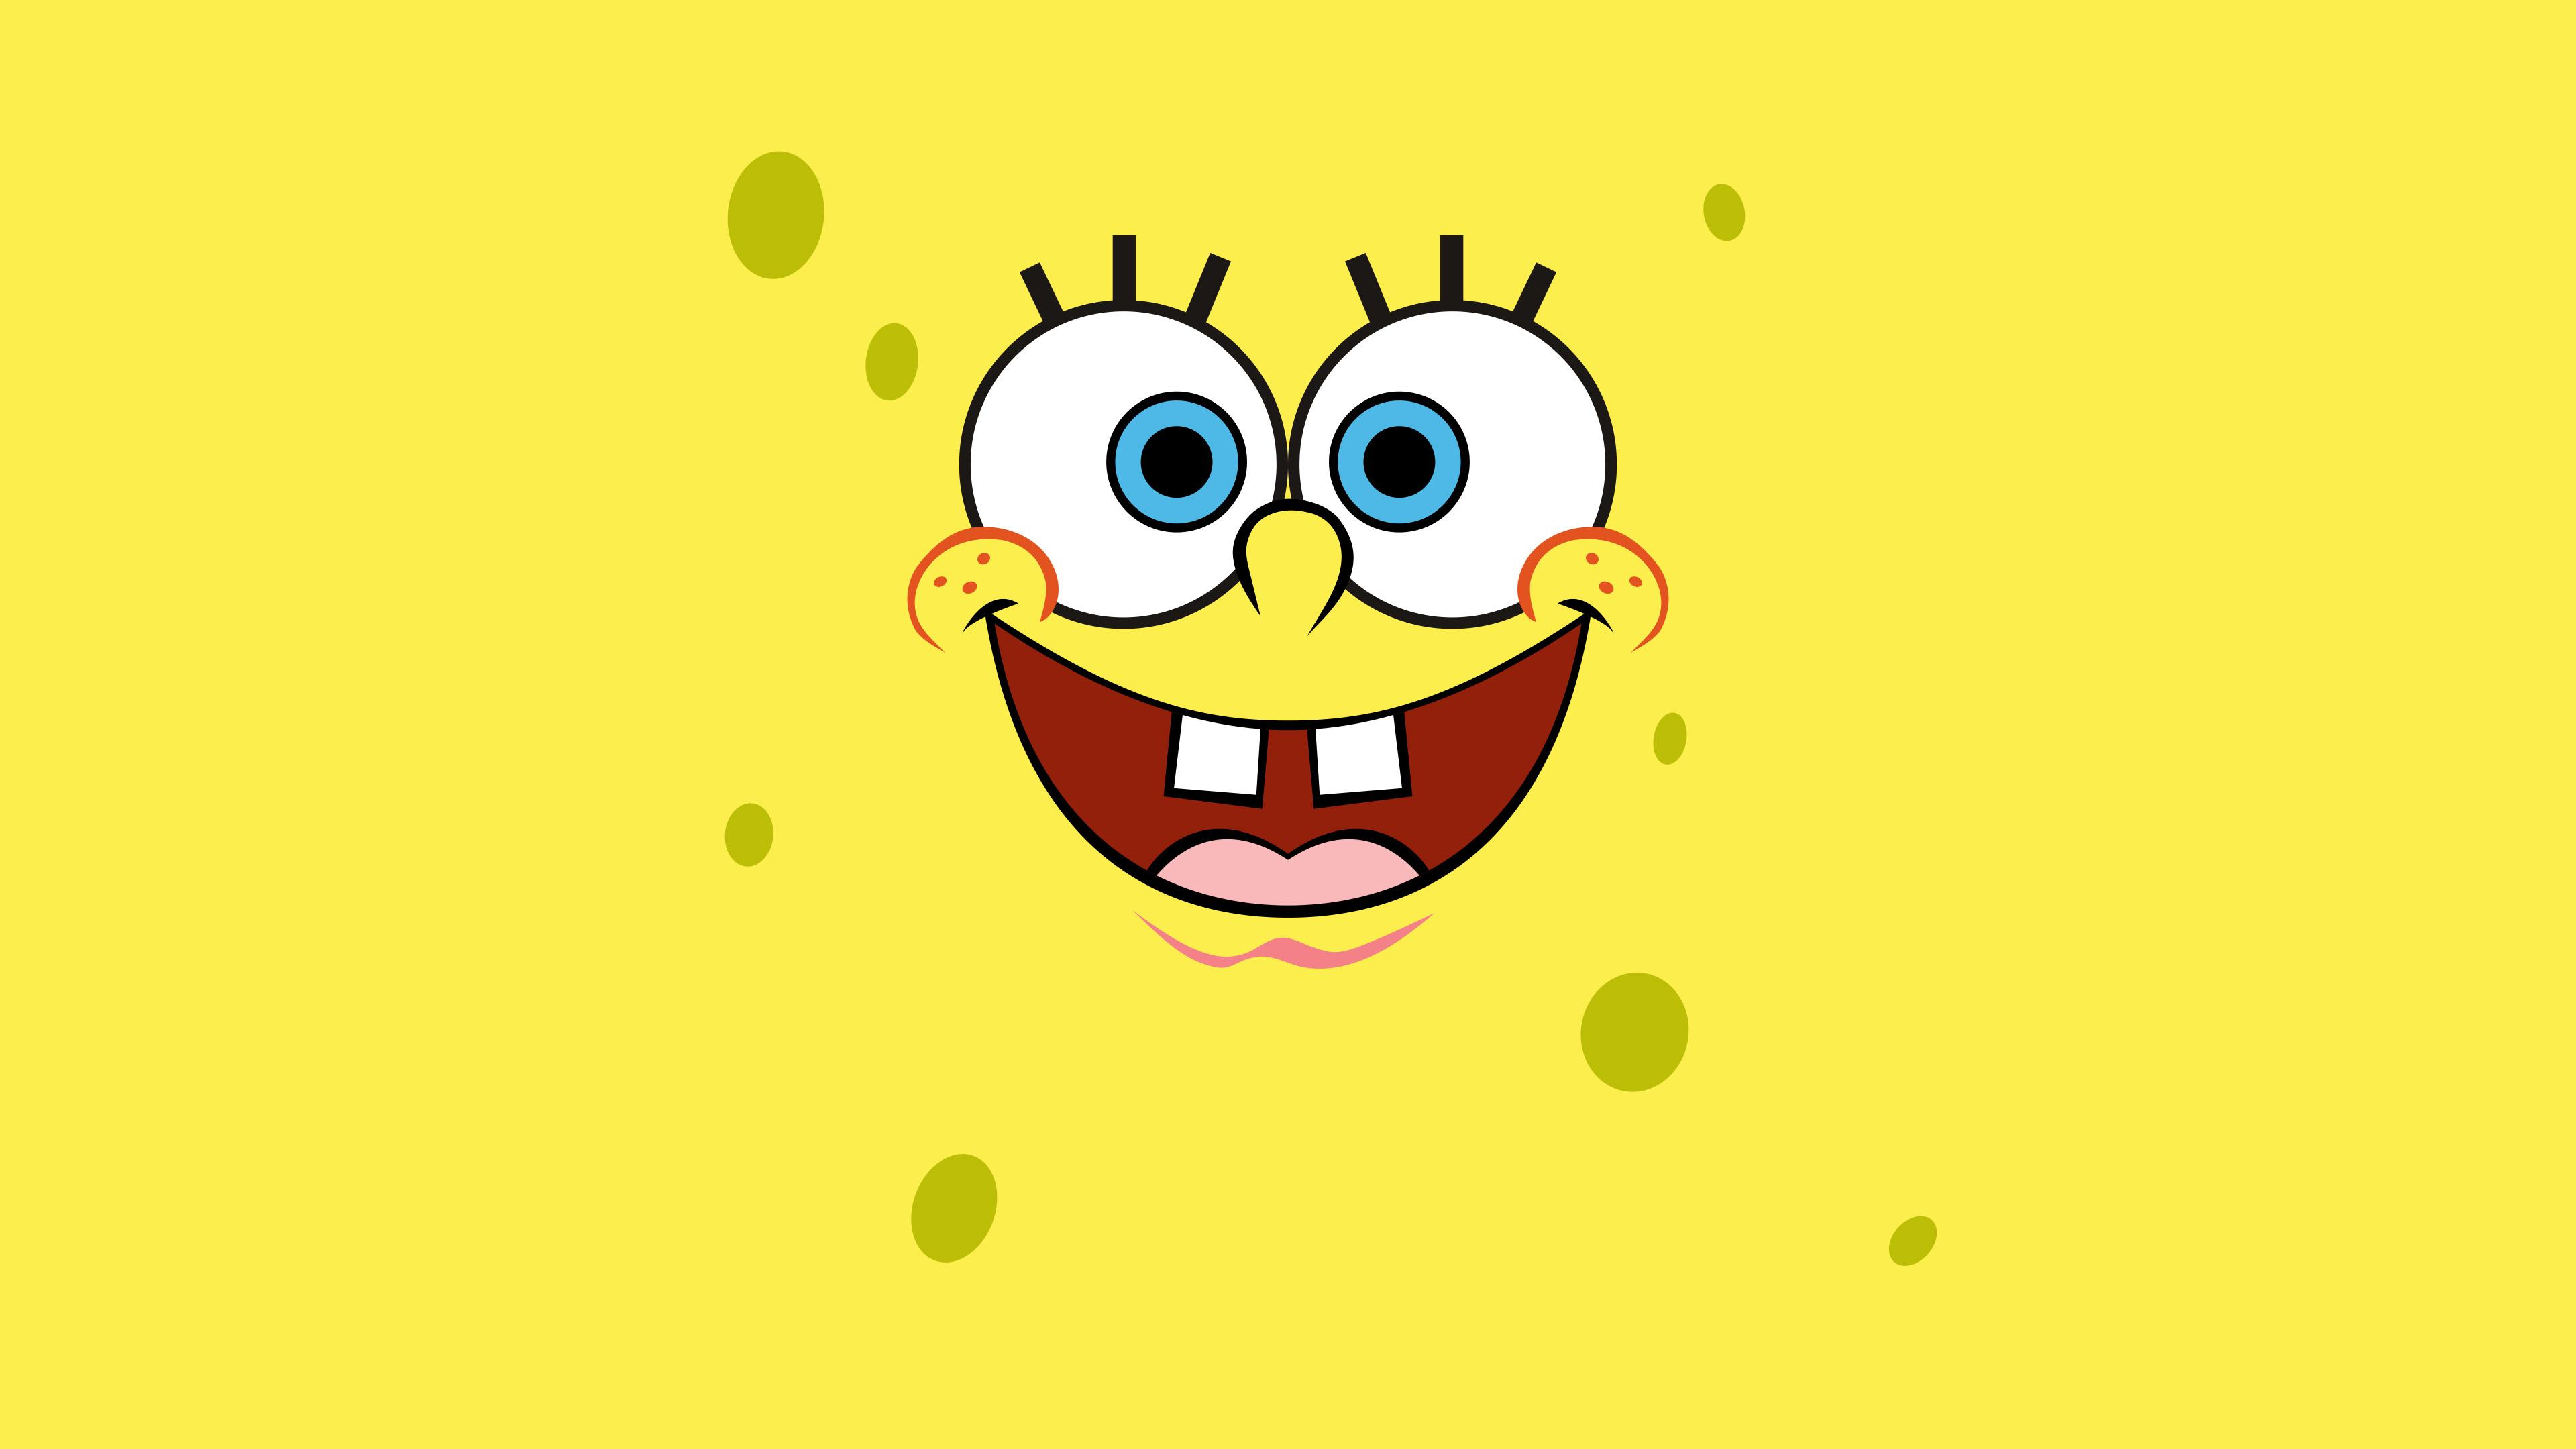 Spongebob Squarepants Minimalist 4k Hd Cartoons 4k Wallpapers